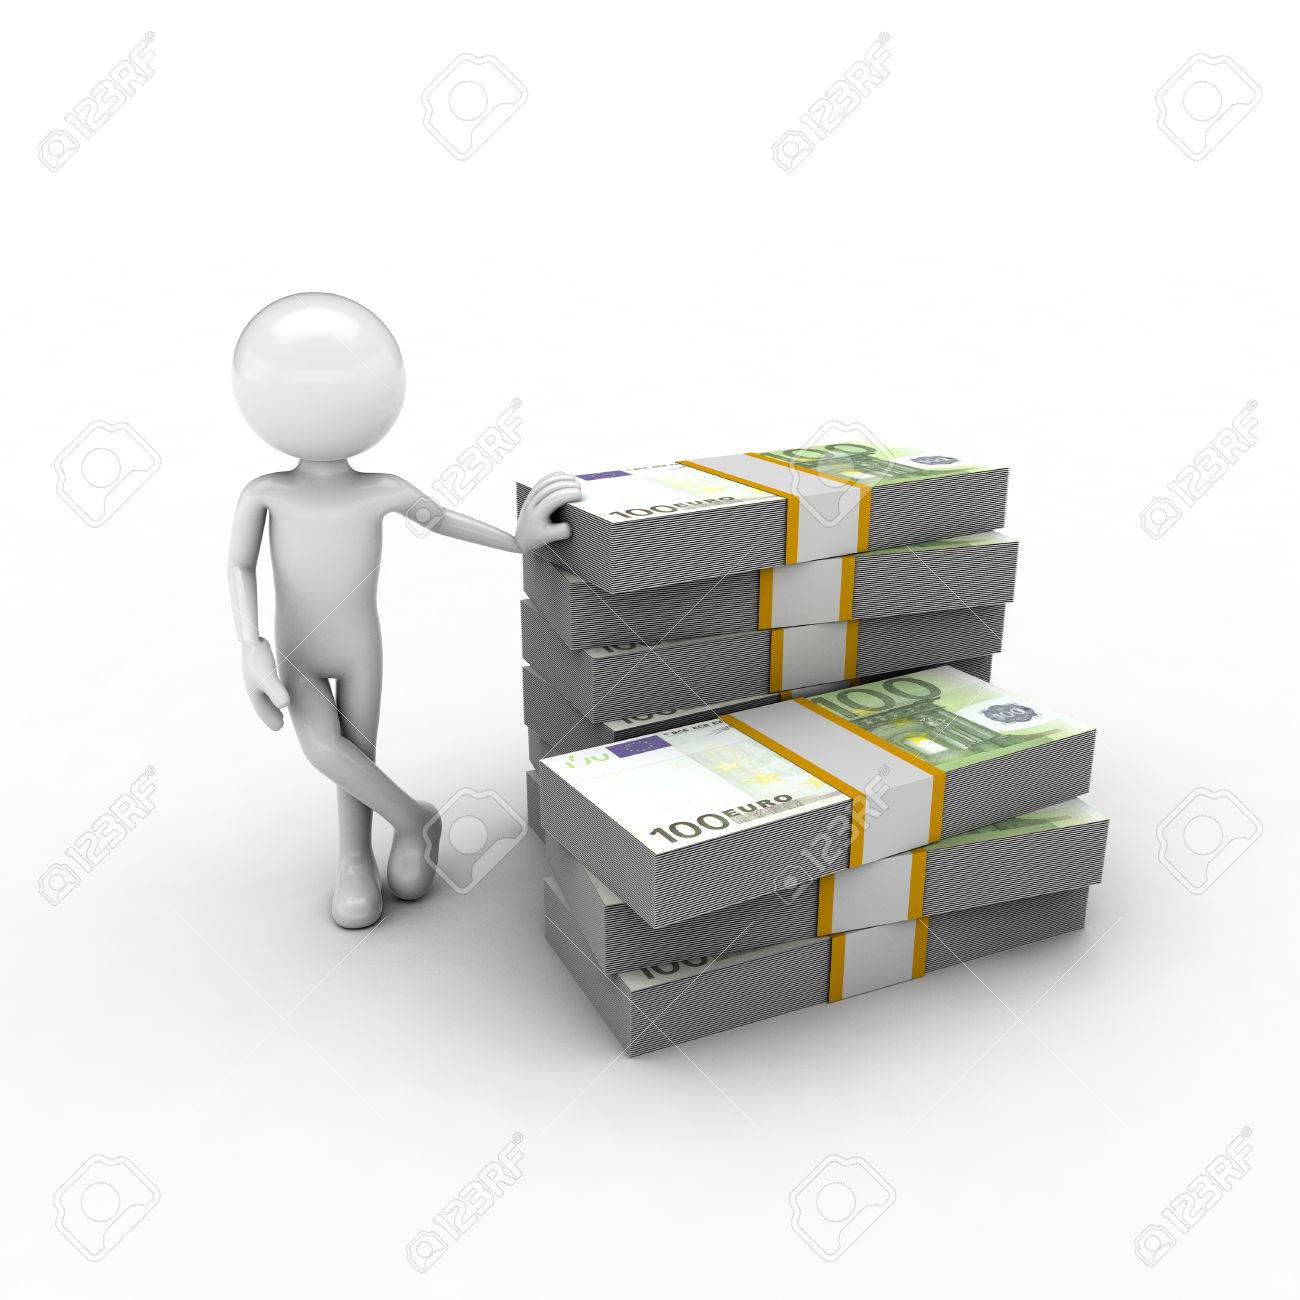 visual describing the economy using monetary and human figures Stock Photo - 57570179